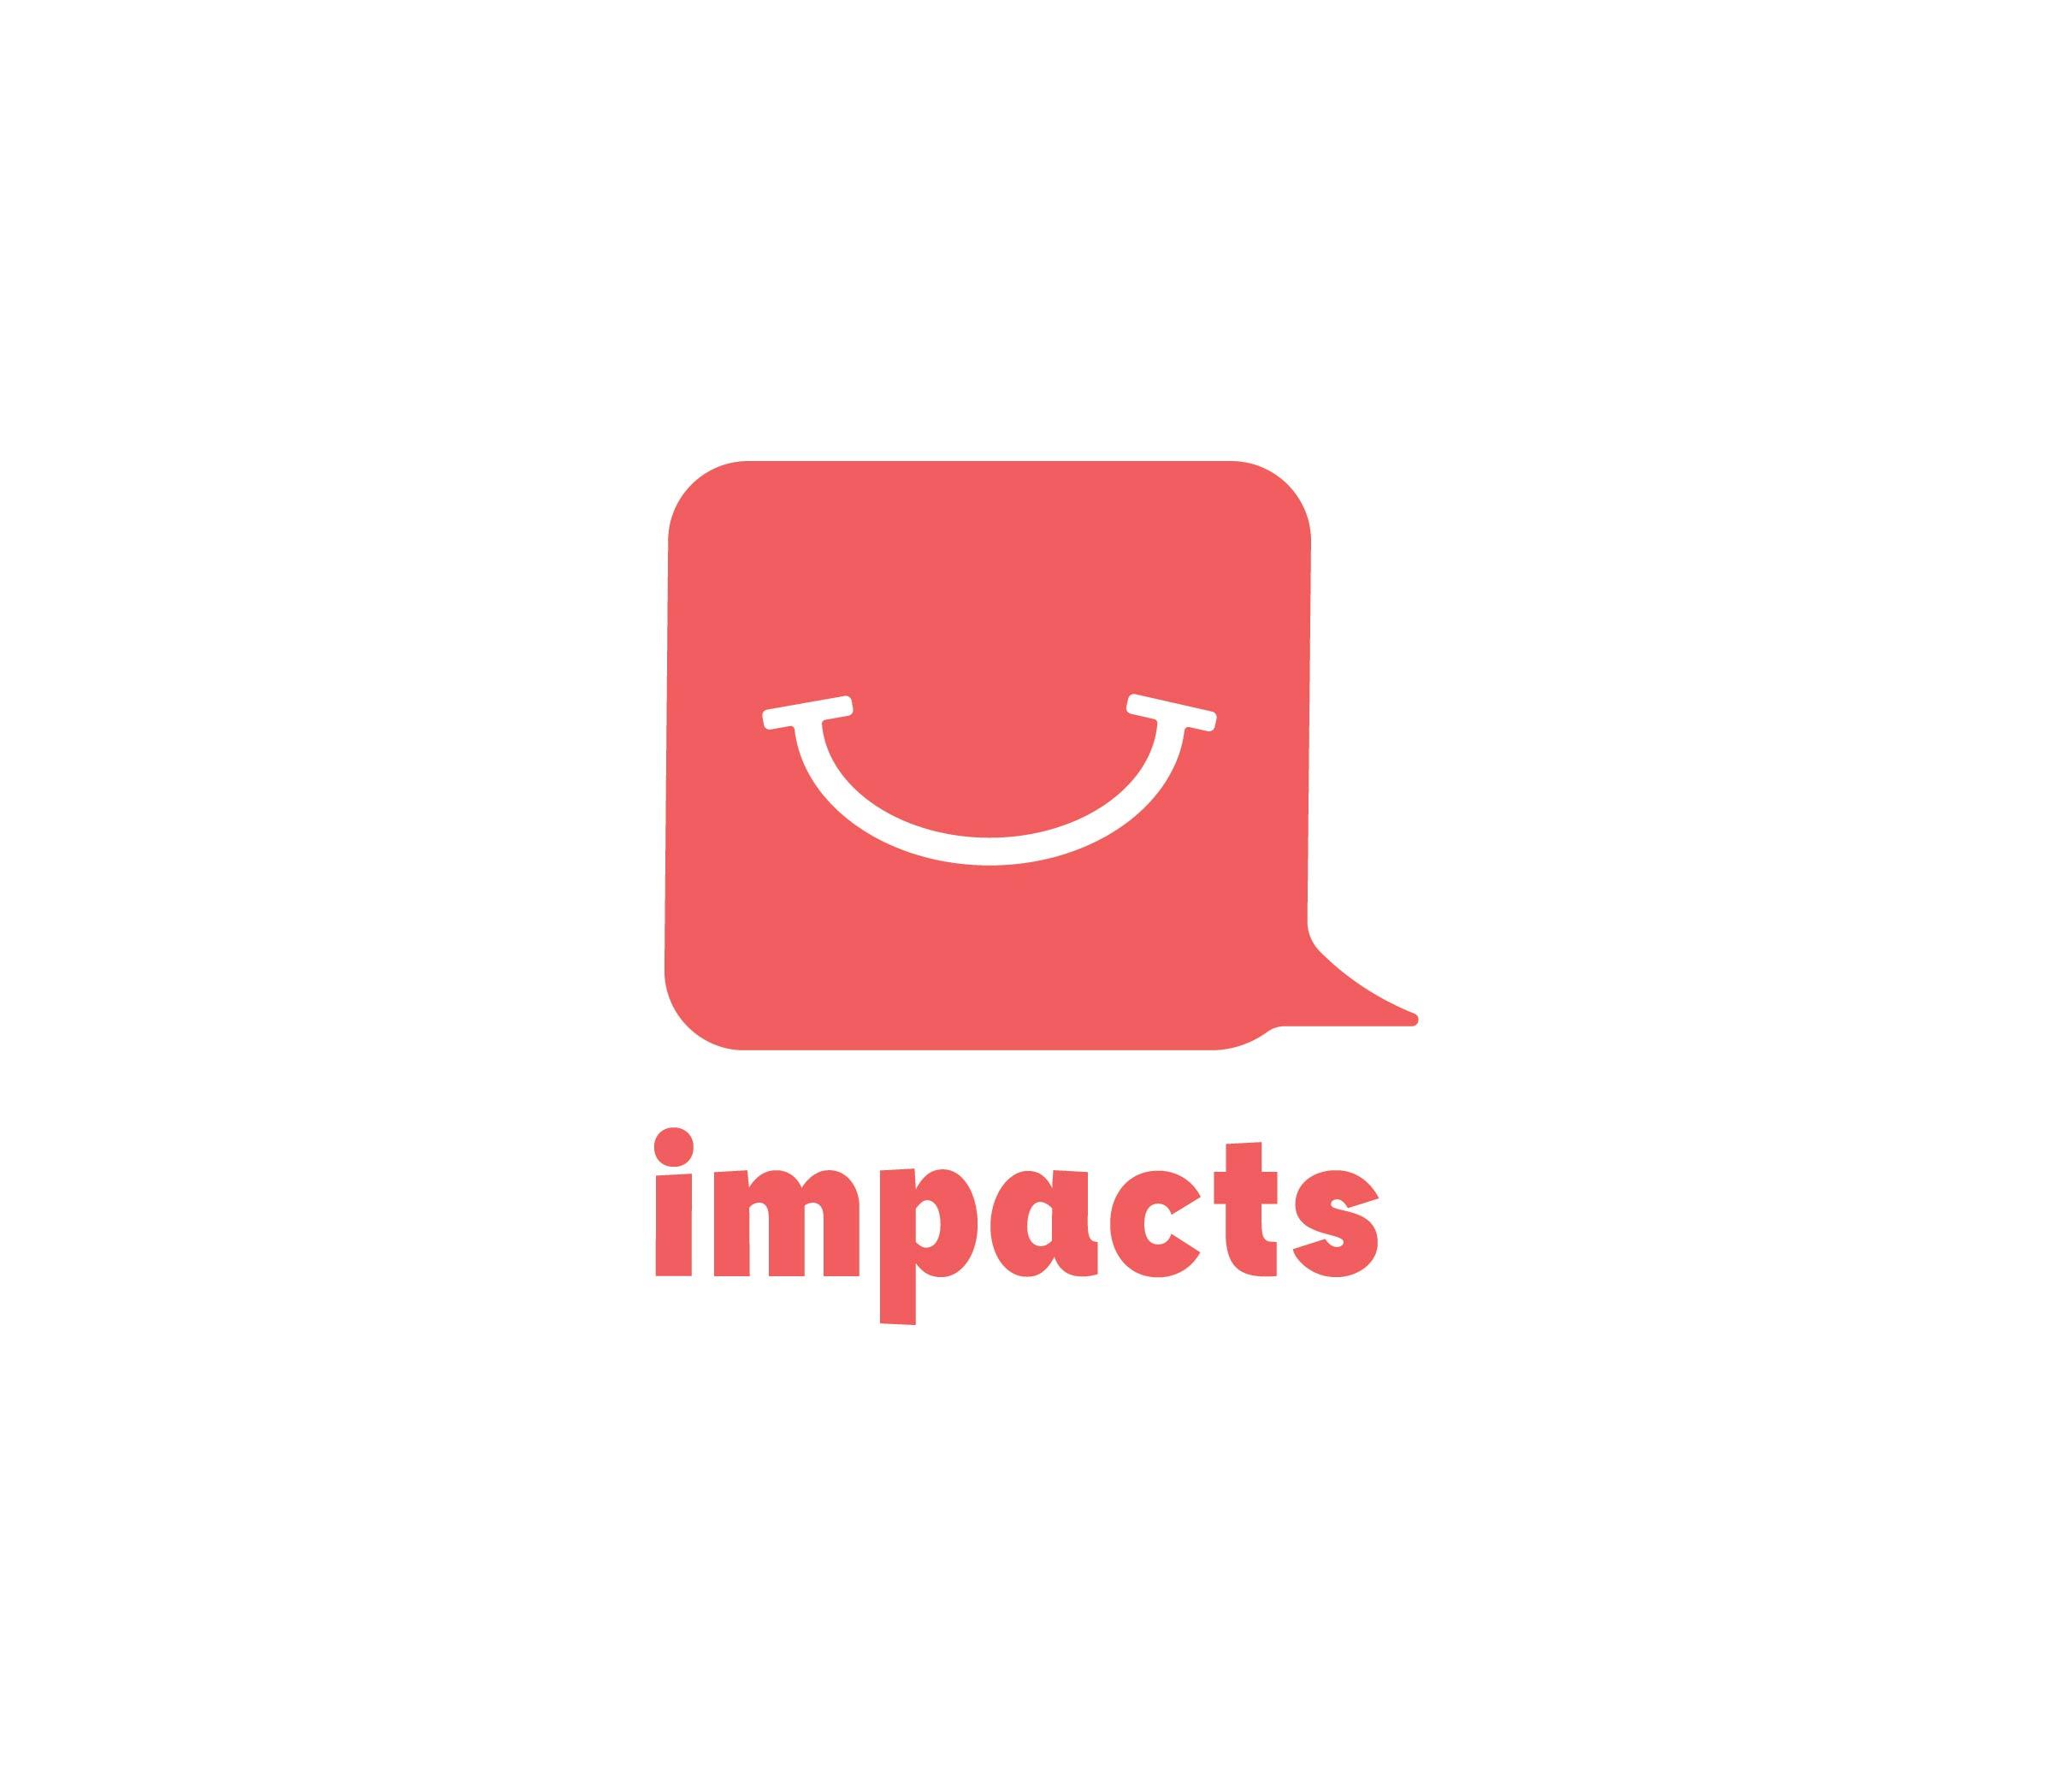 IMPACTS LOGO-04-04-04.jpg